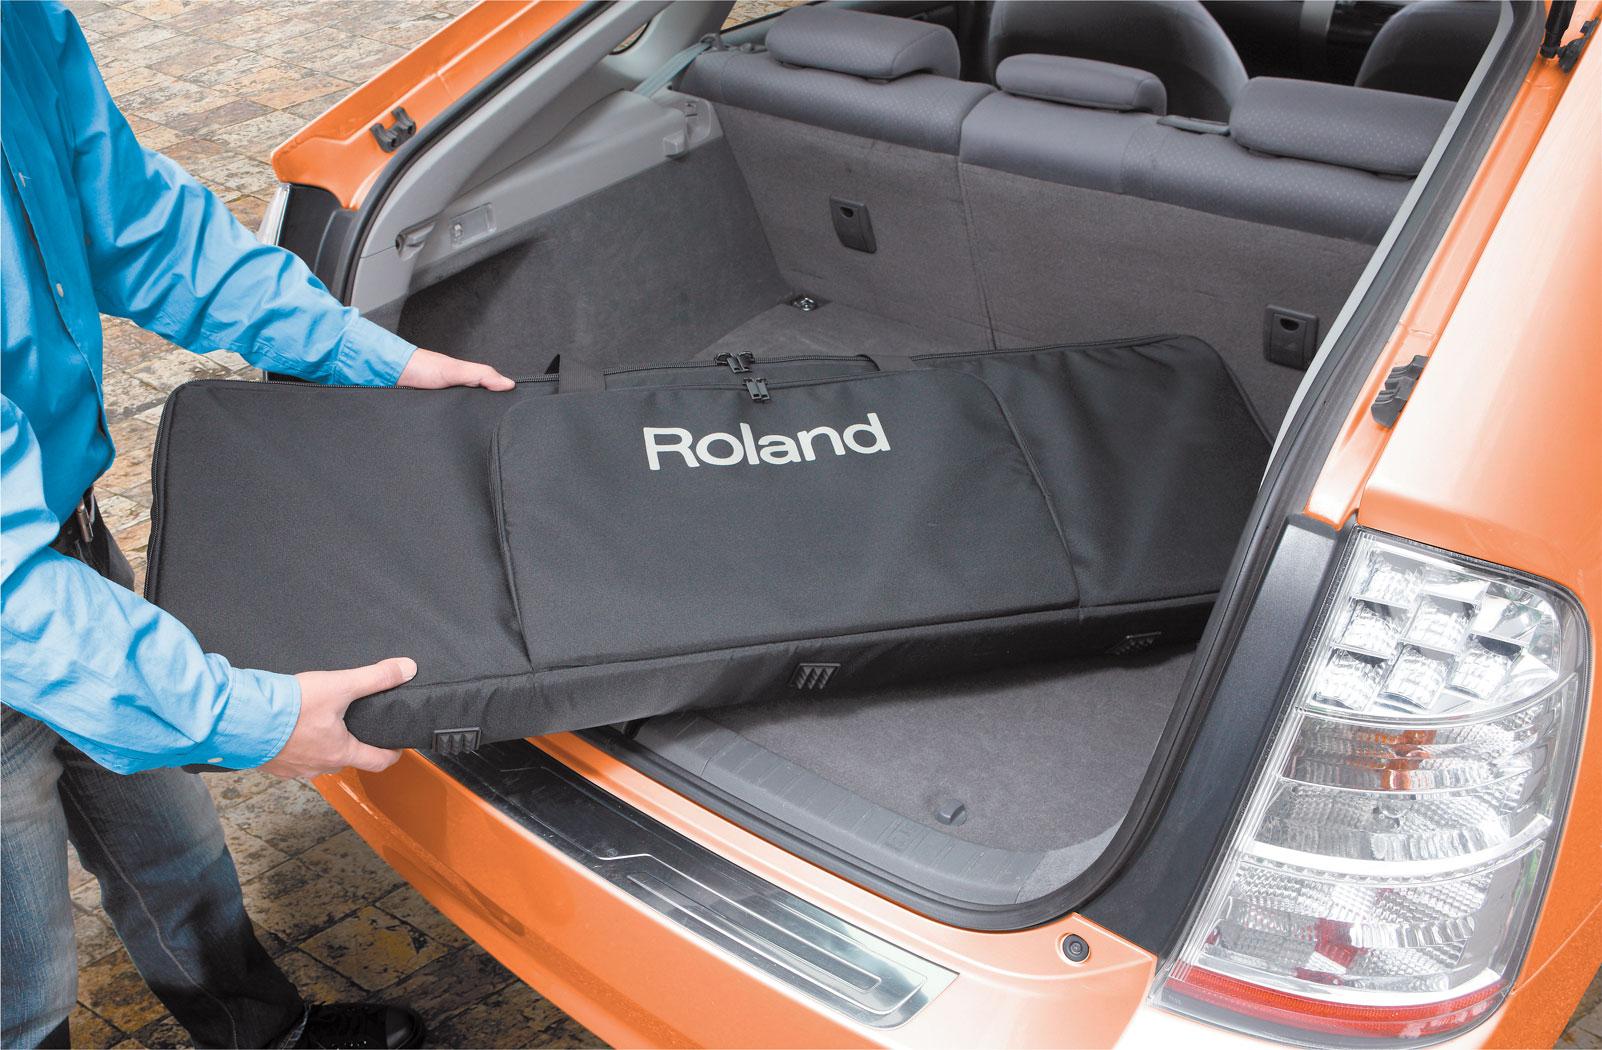 rd 64 trunk 1 gal - Roland Rd-64 Digital Piano